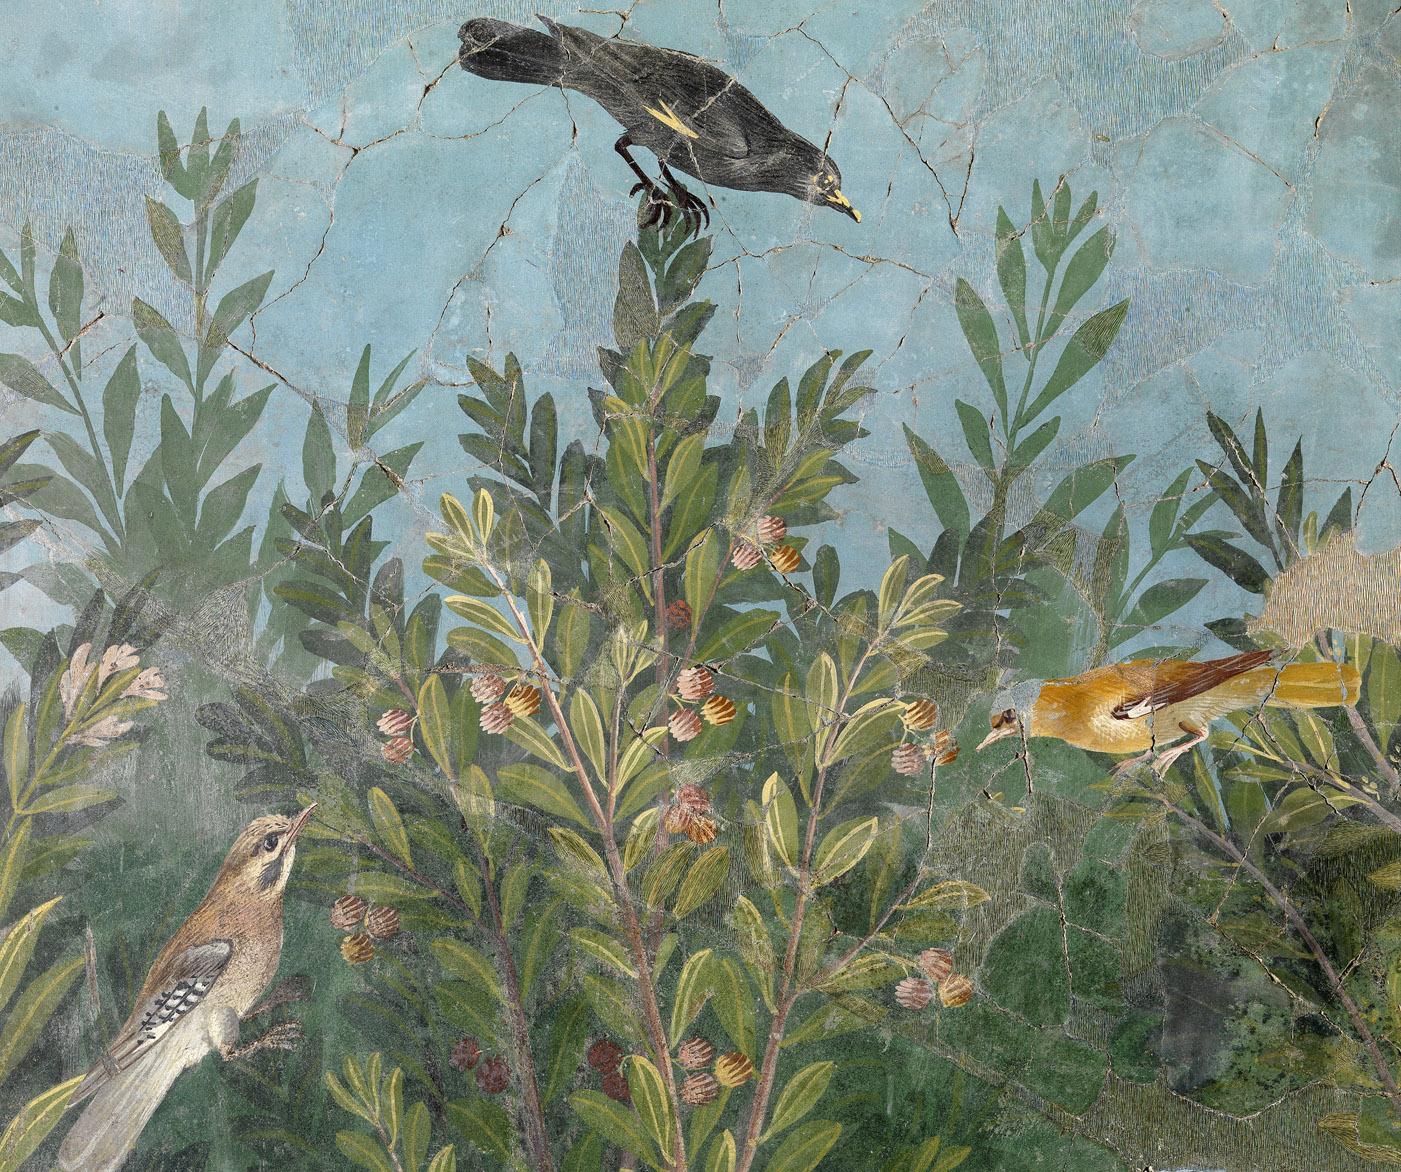 Art romain. IIIe style pompéien. Oecus 32. Paroi Est. Peinture. Boscoreale, Antiquarium Nazionale, deposito.